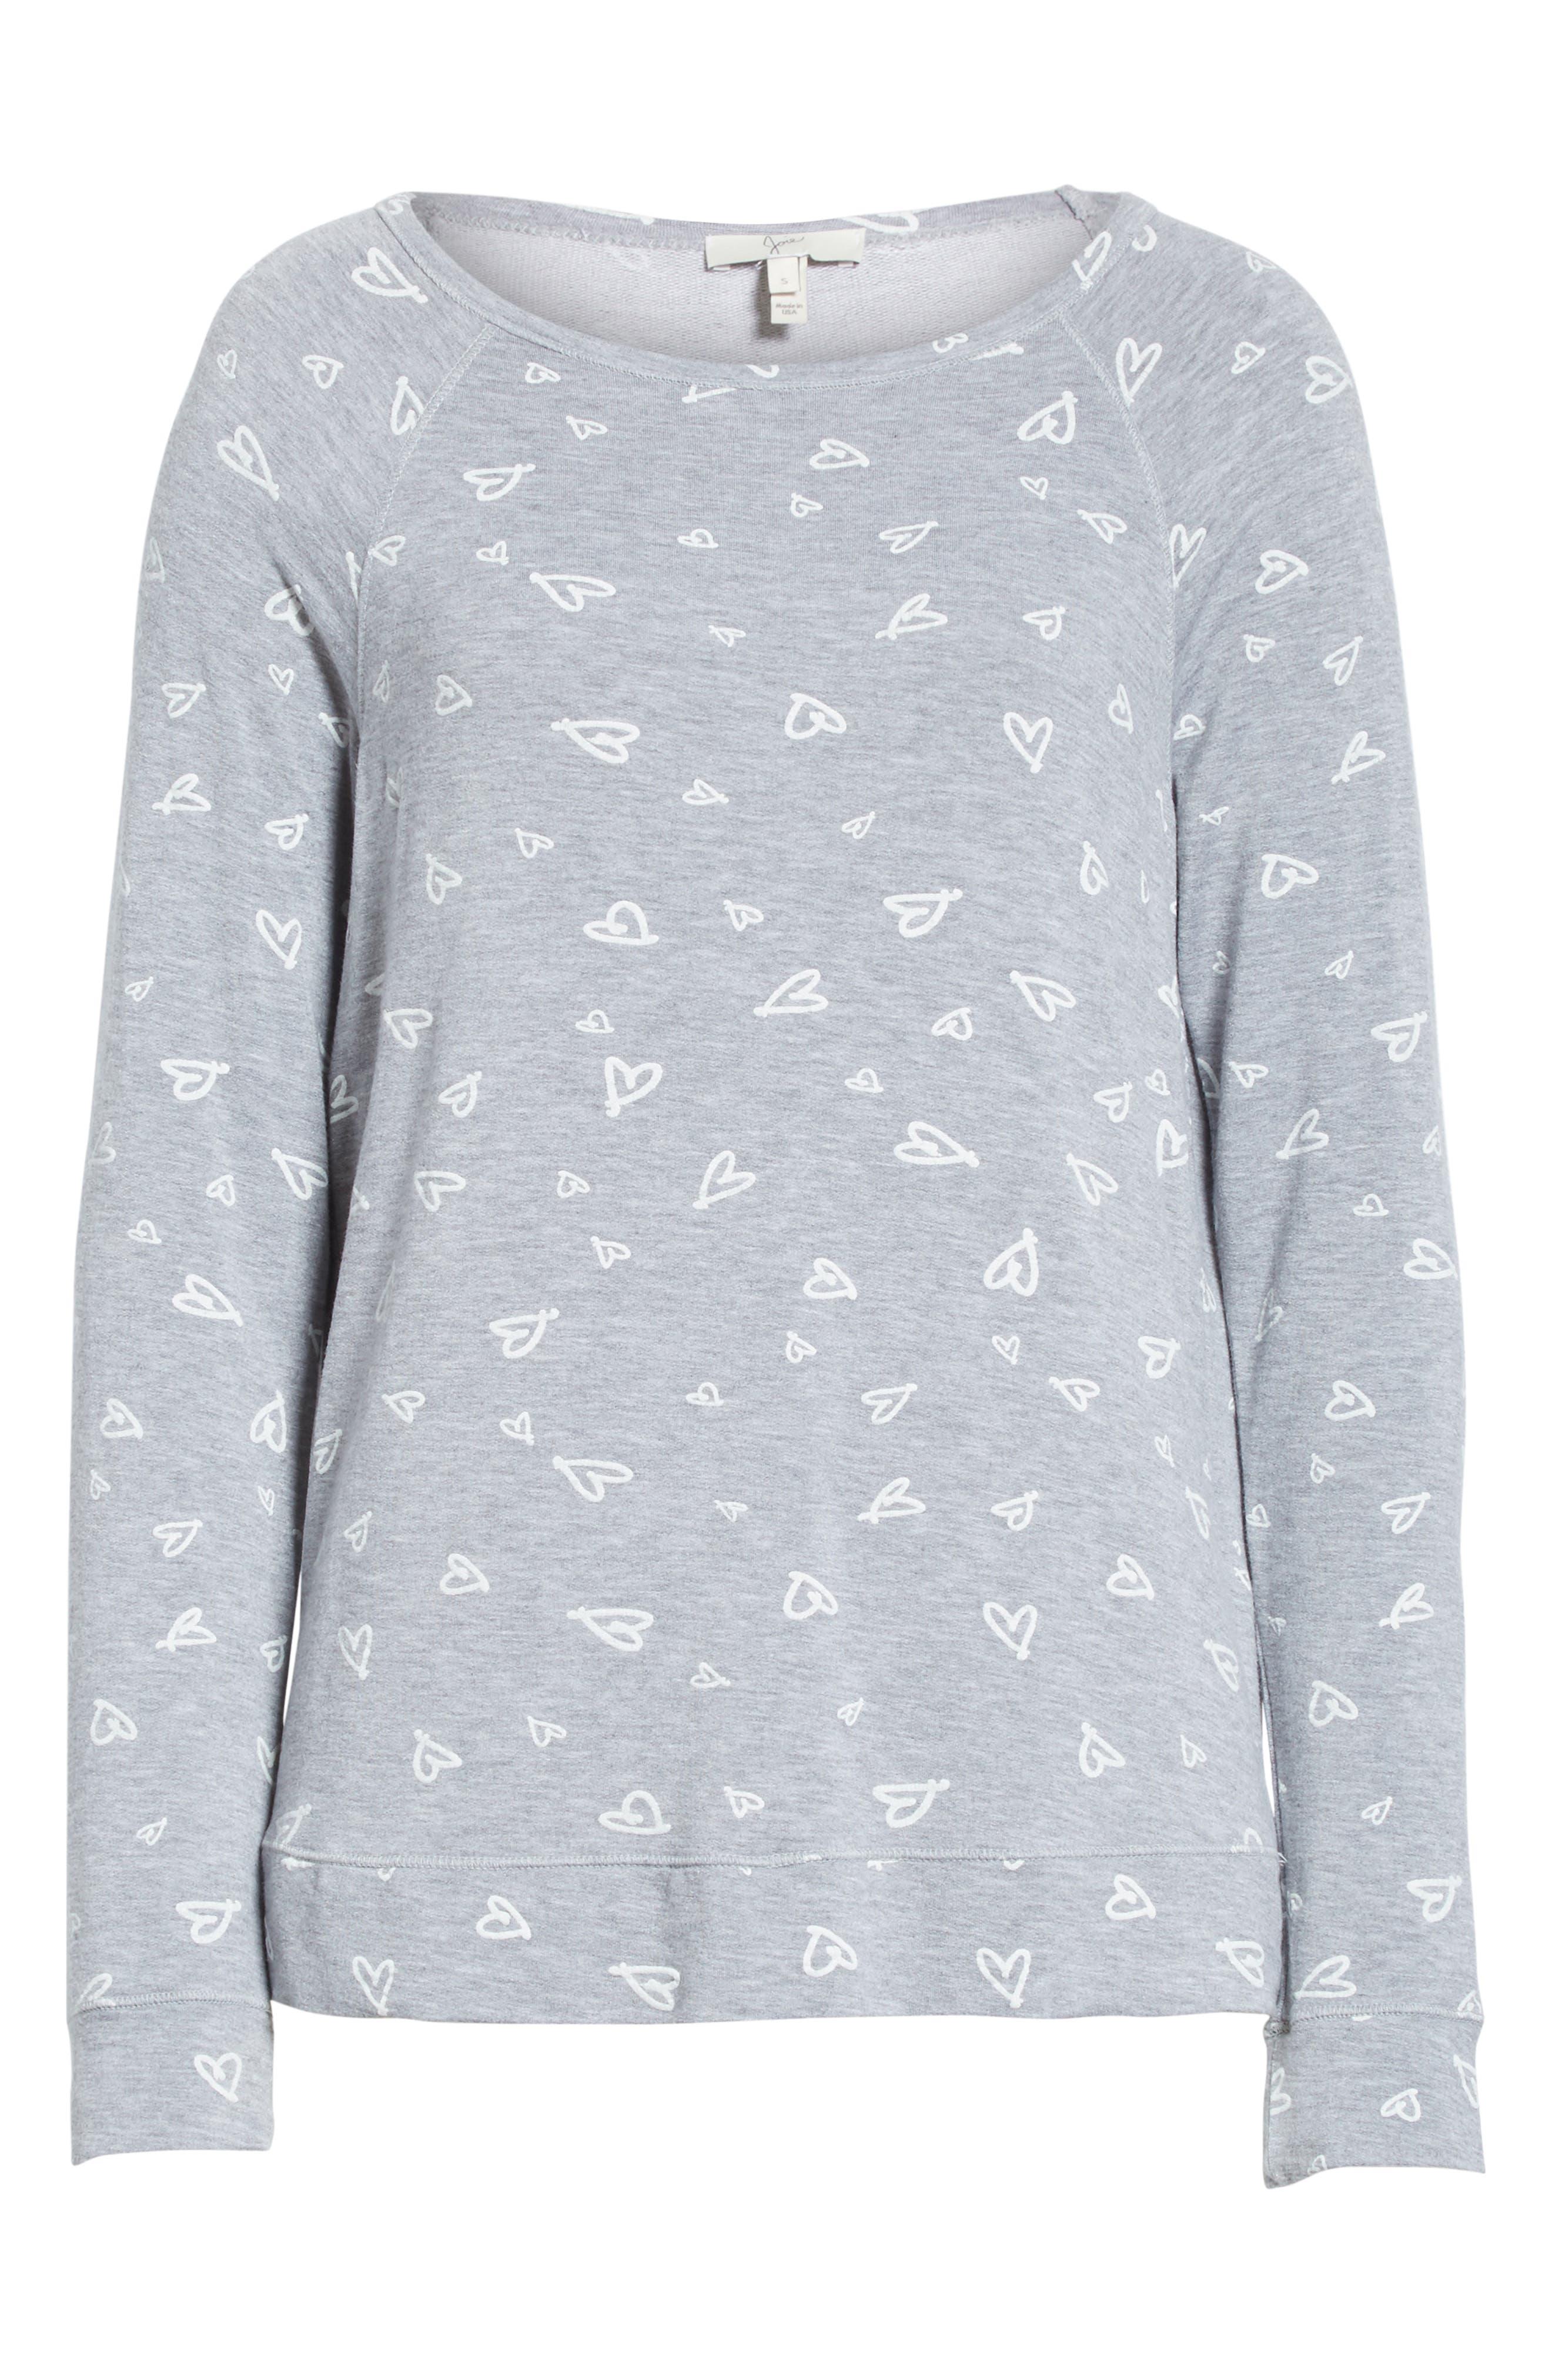 Annora B Print Cotton & Modal Blend Sweatshirt,                             Alternate thumbnail 6, color,                             071